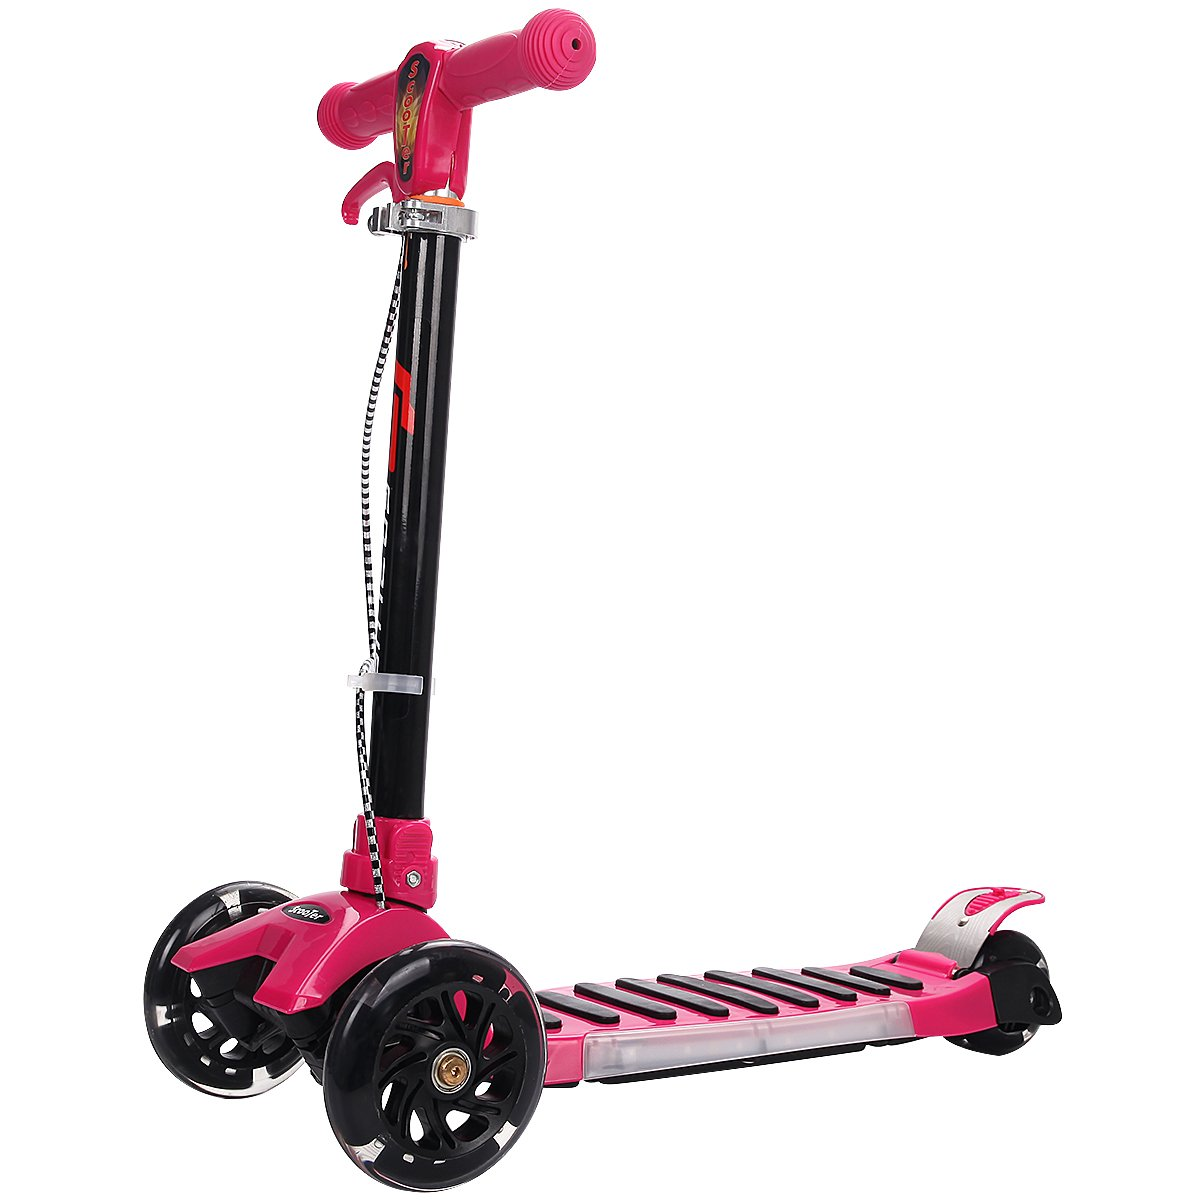 vengaconmigo Patinete Plegable Scooter con Freno de Mano Altura Ajustable 3 Ruedas Luminosas para Ni/ños de 2-9 A/ños Carga M/áxima 50KG Fucsia